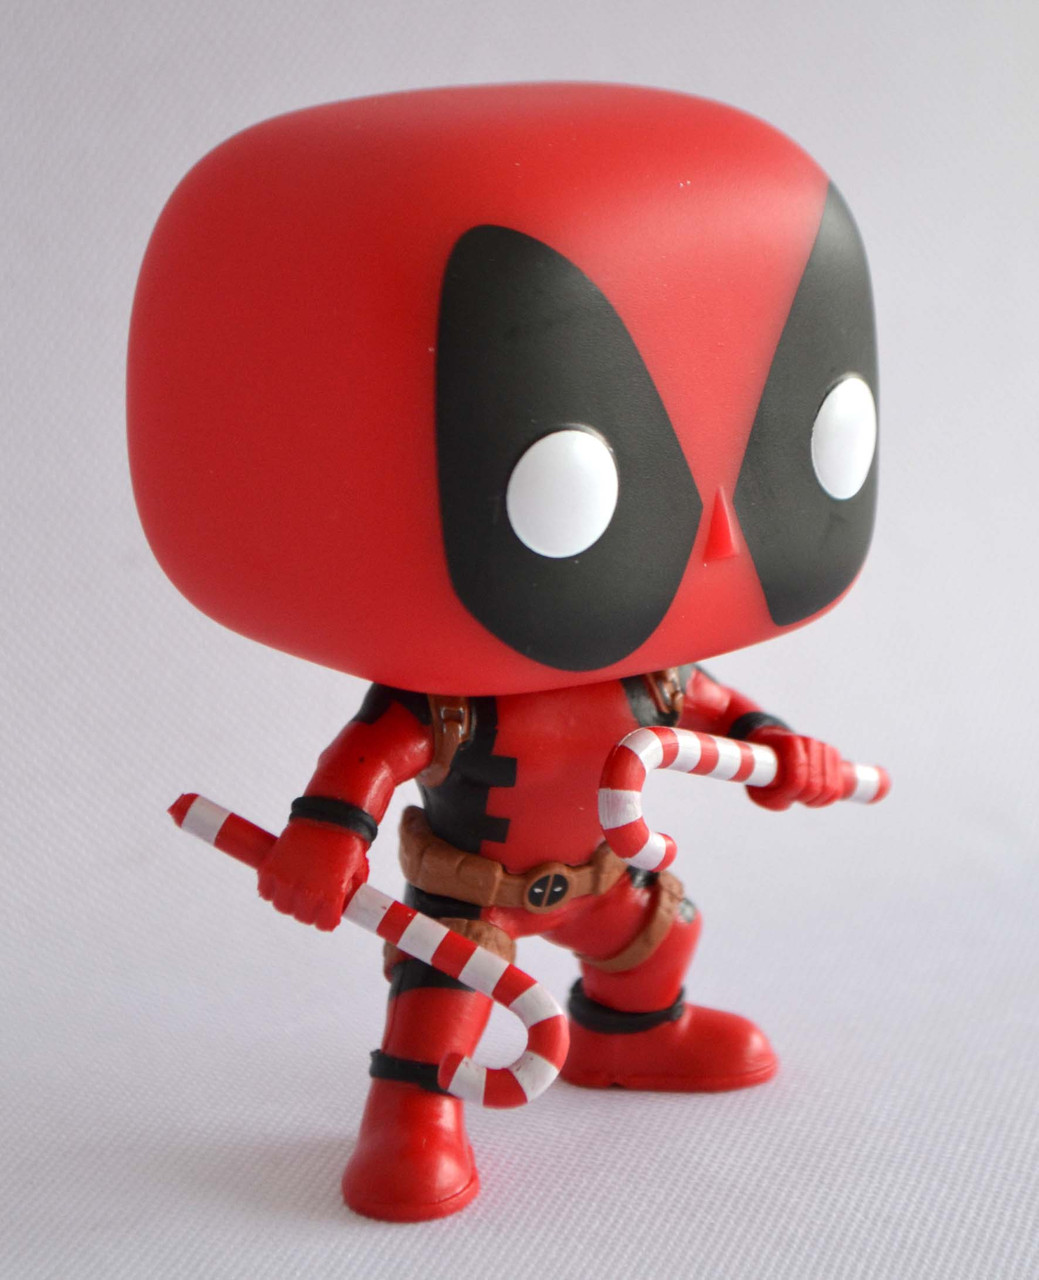 Колекційна фігурка Funko Pop! Marvel: Deadpool with candy